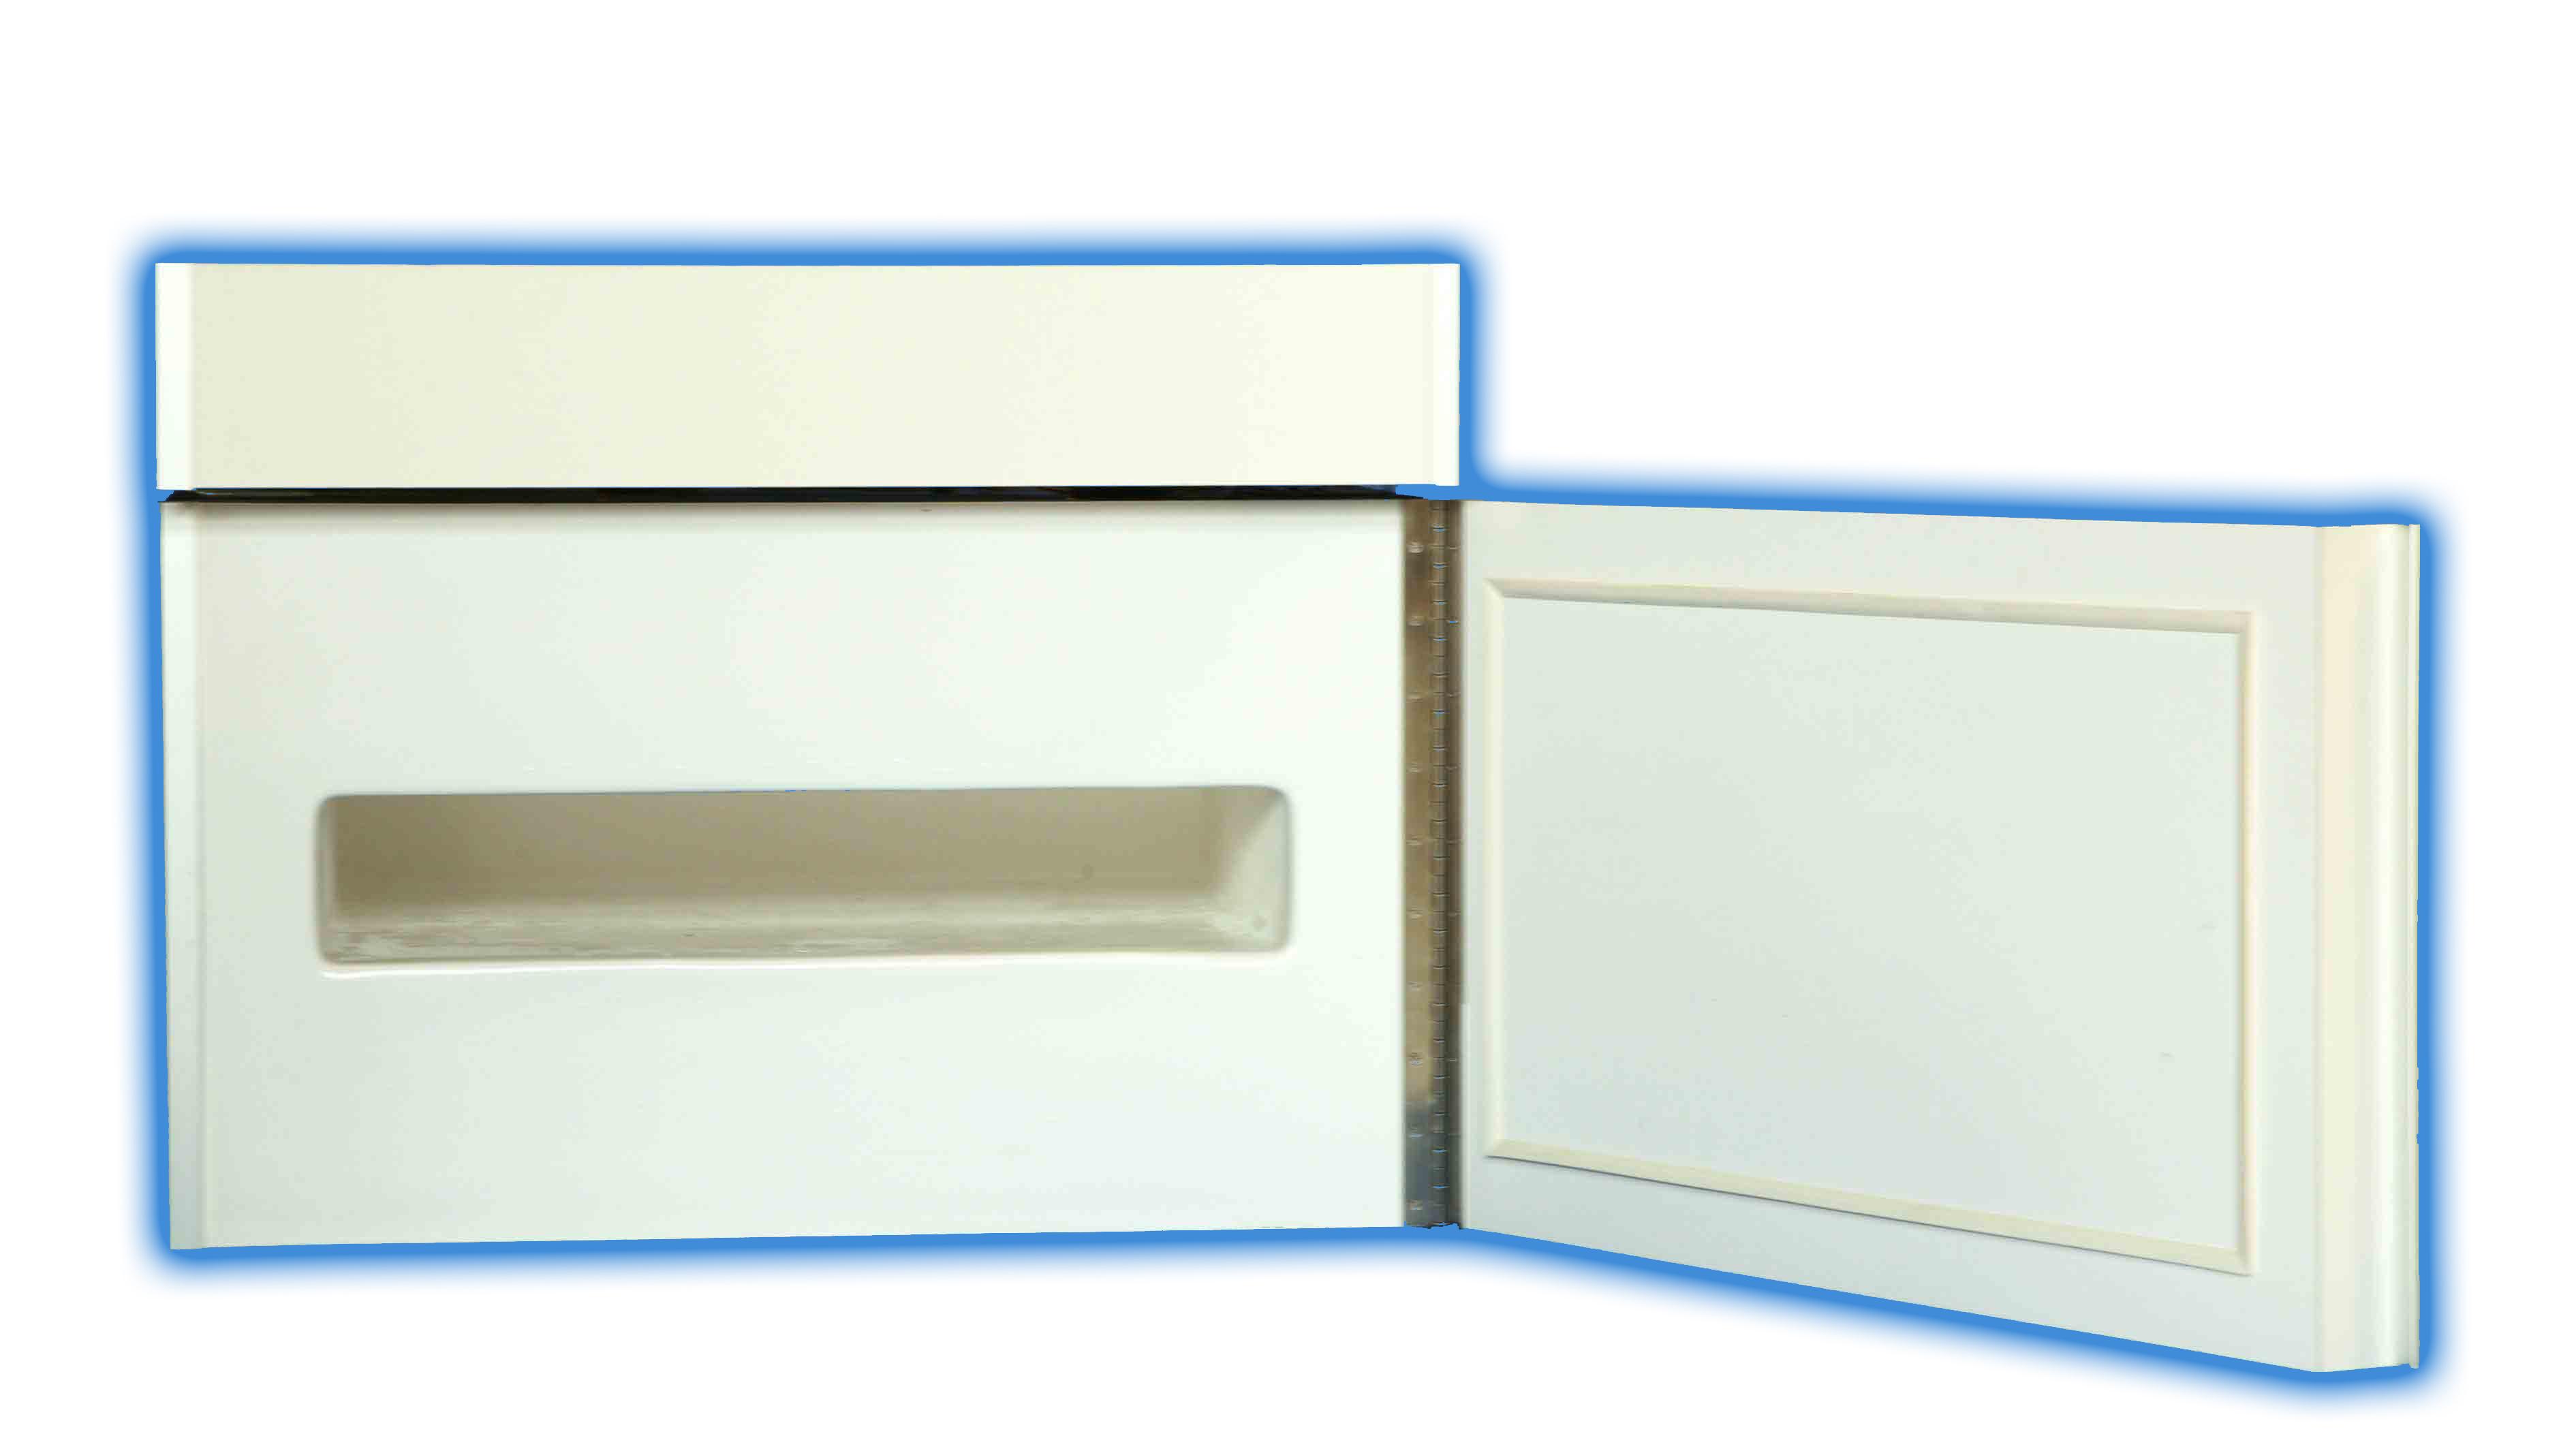 Sun Frost RFVB Vaccine Refrigerator & Freezer